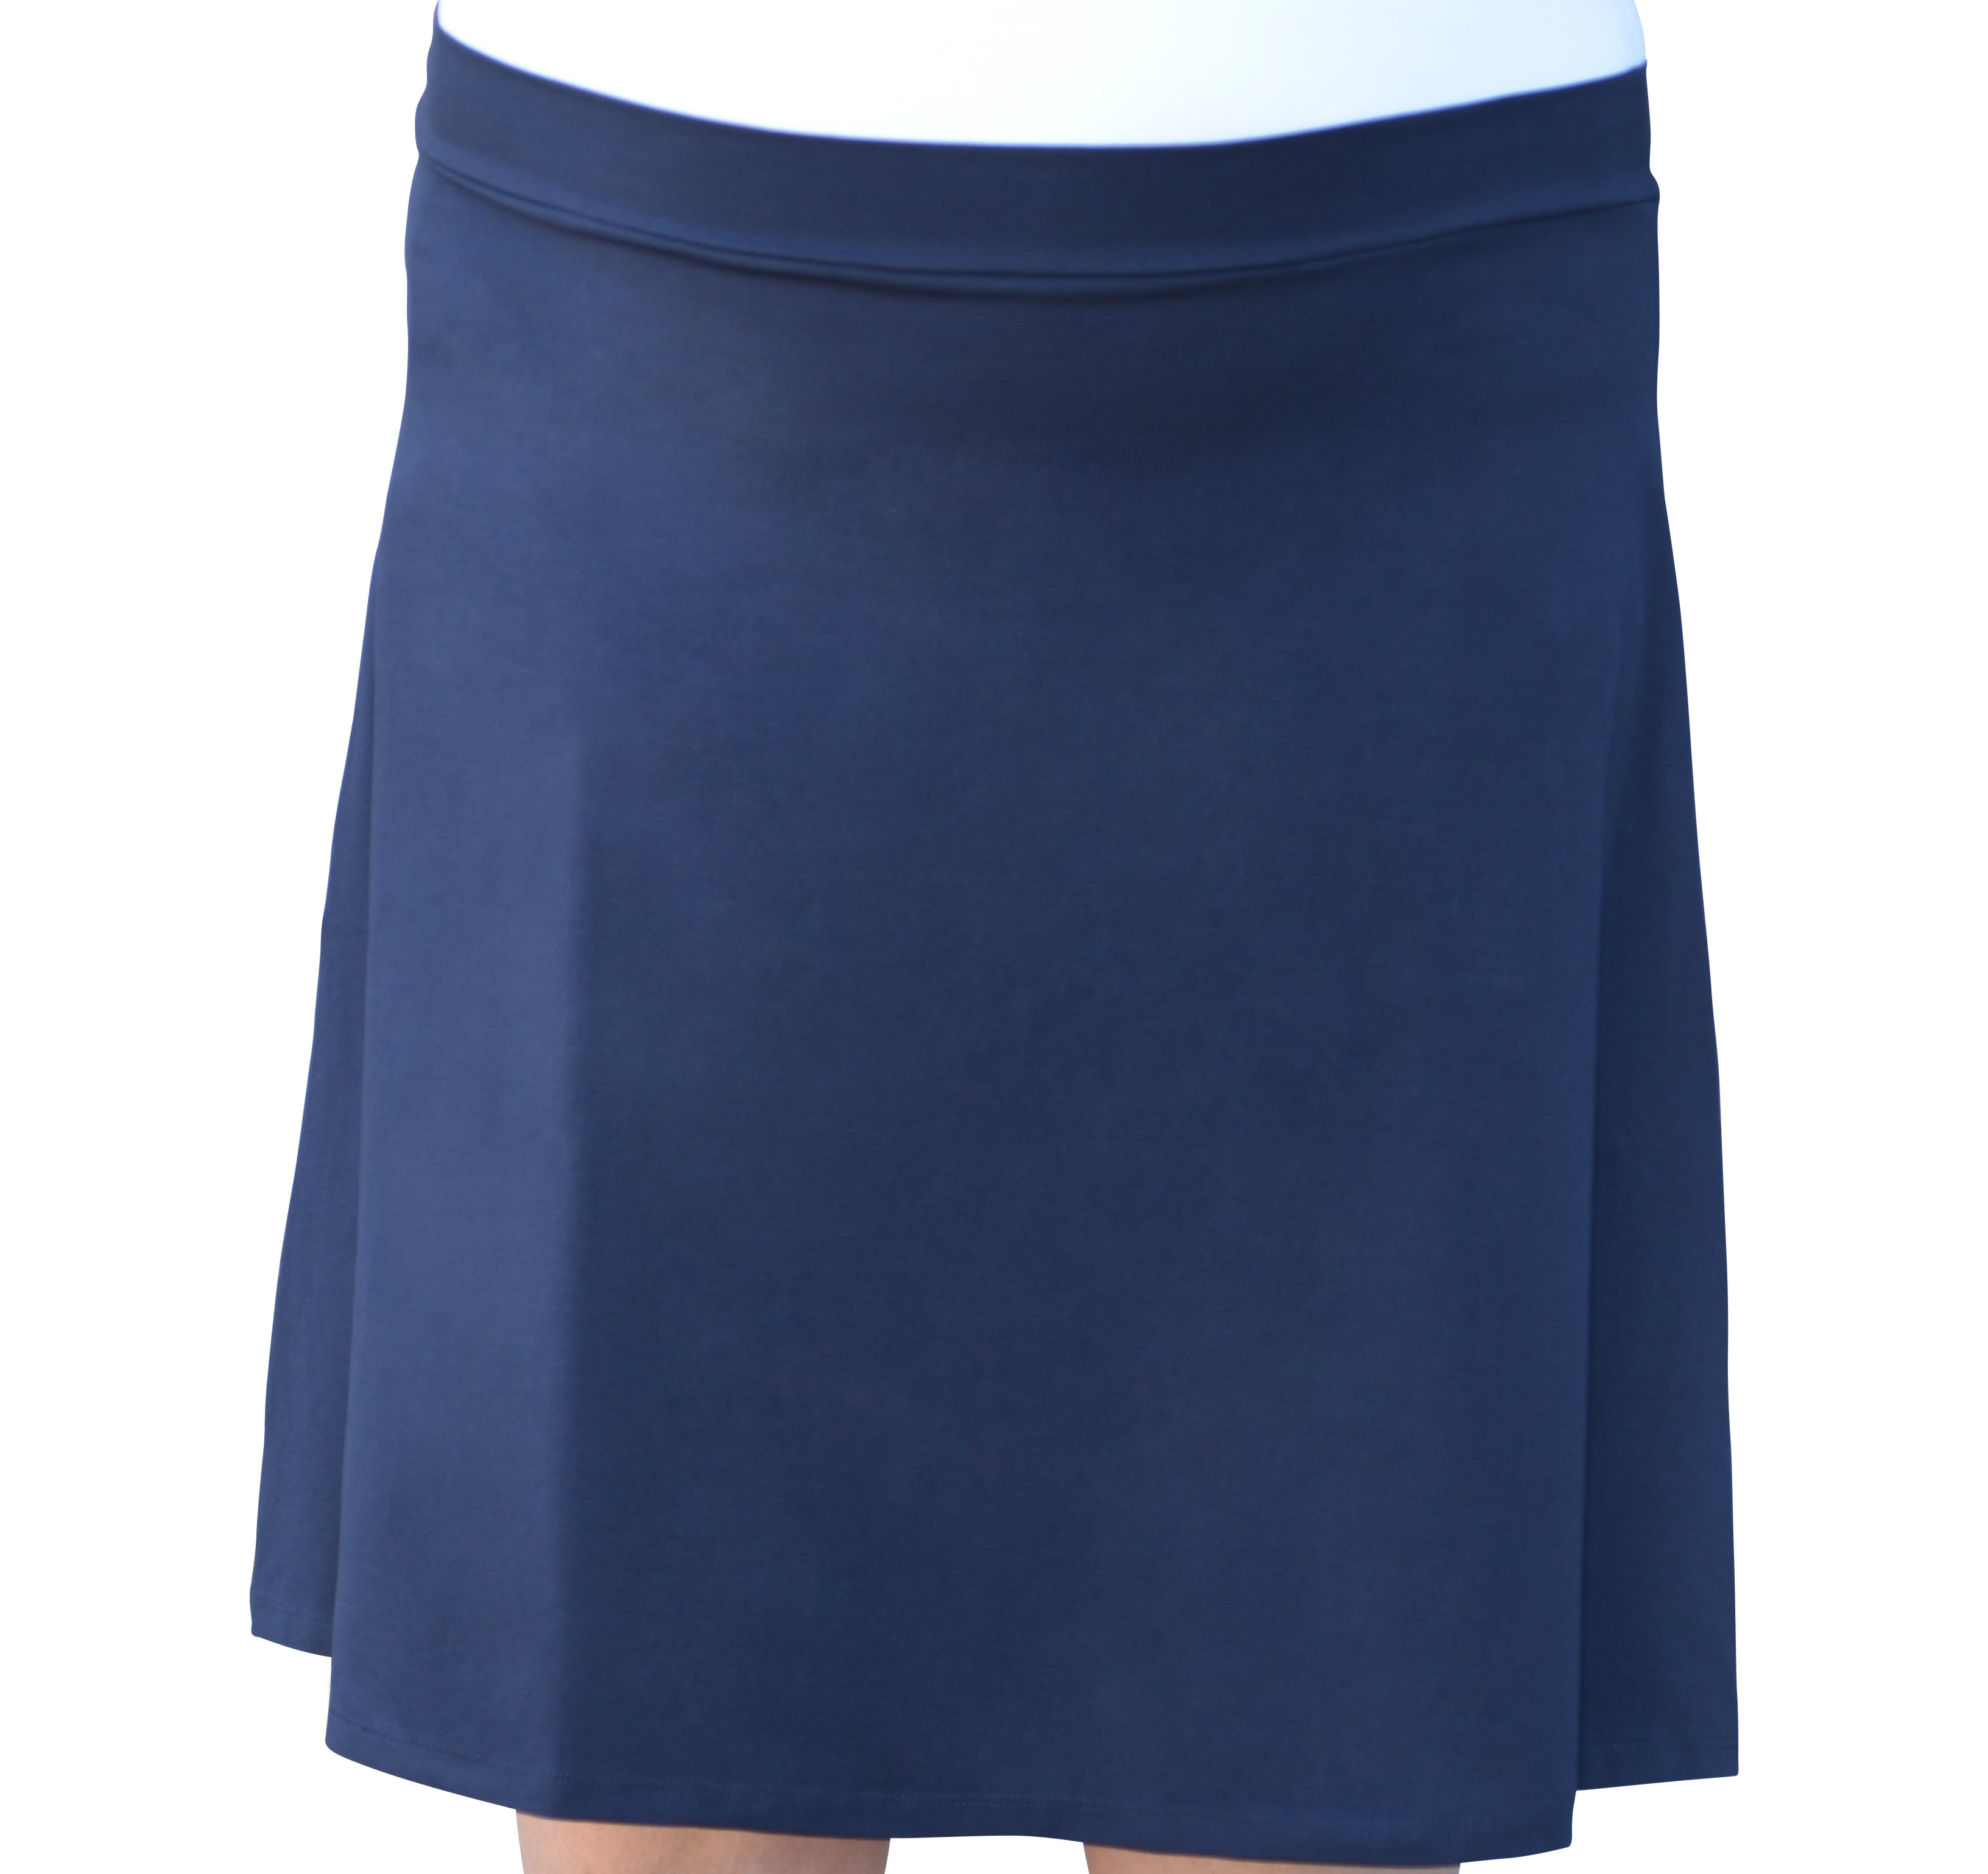 7d747085dfae2 Modest Skirts for Women - Long and Knee Length Skirts